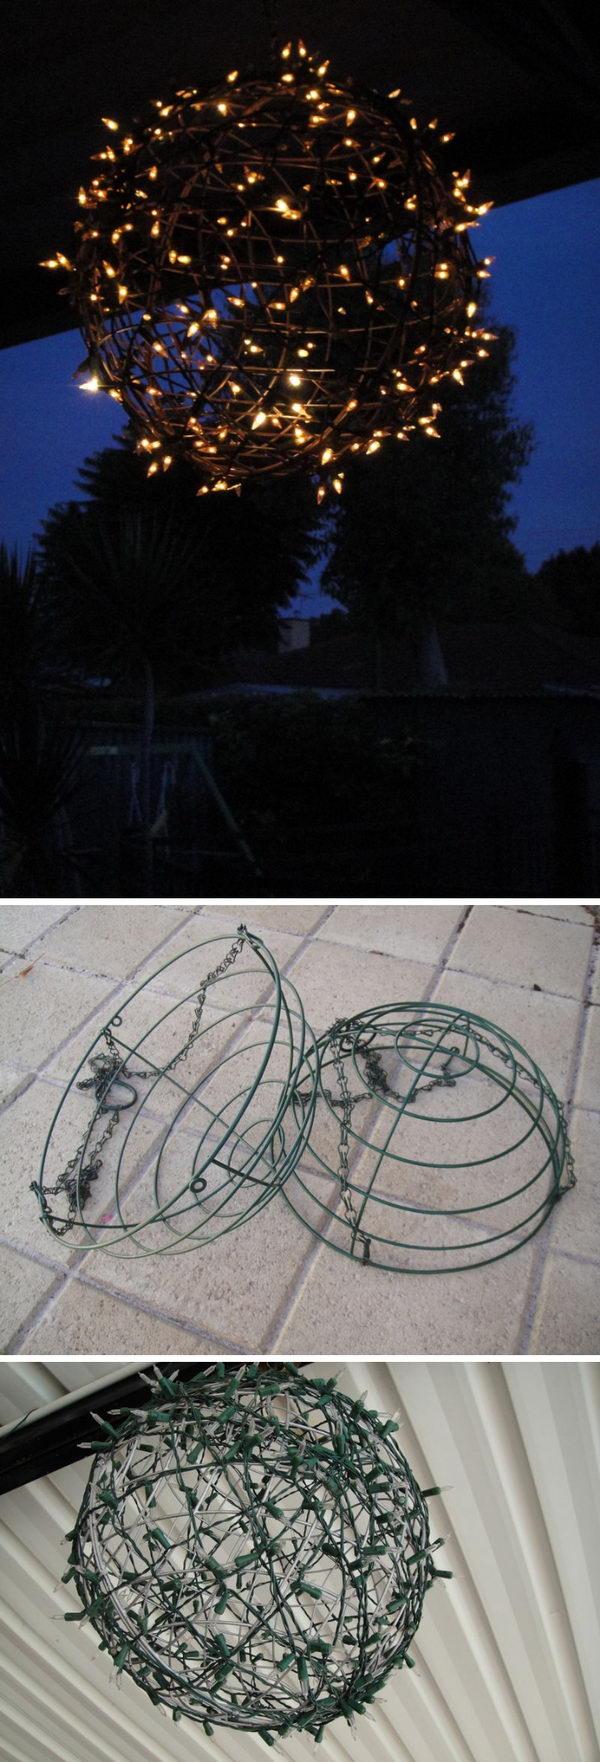 1 outdoor lighting diy ideas tutorials - 15 Easy DIY Outdoor Lighting Ideas